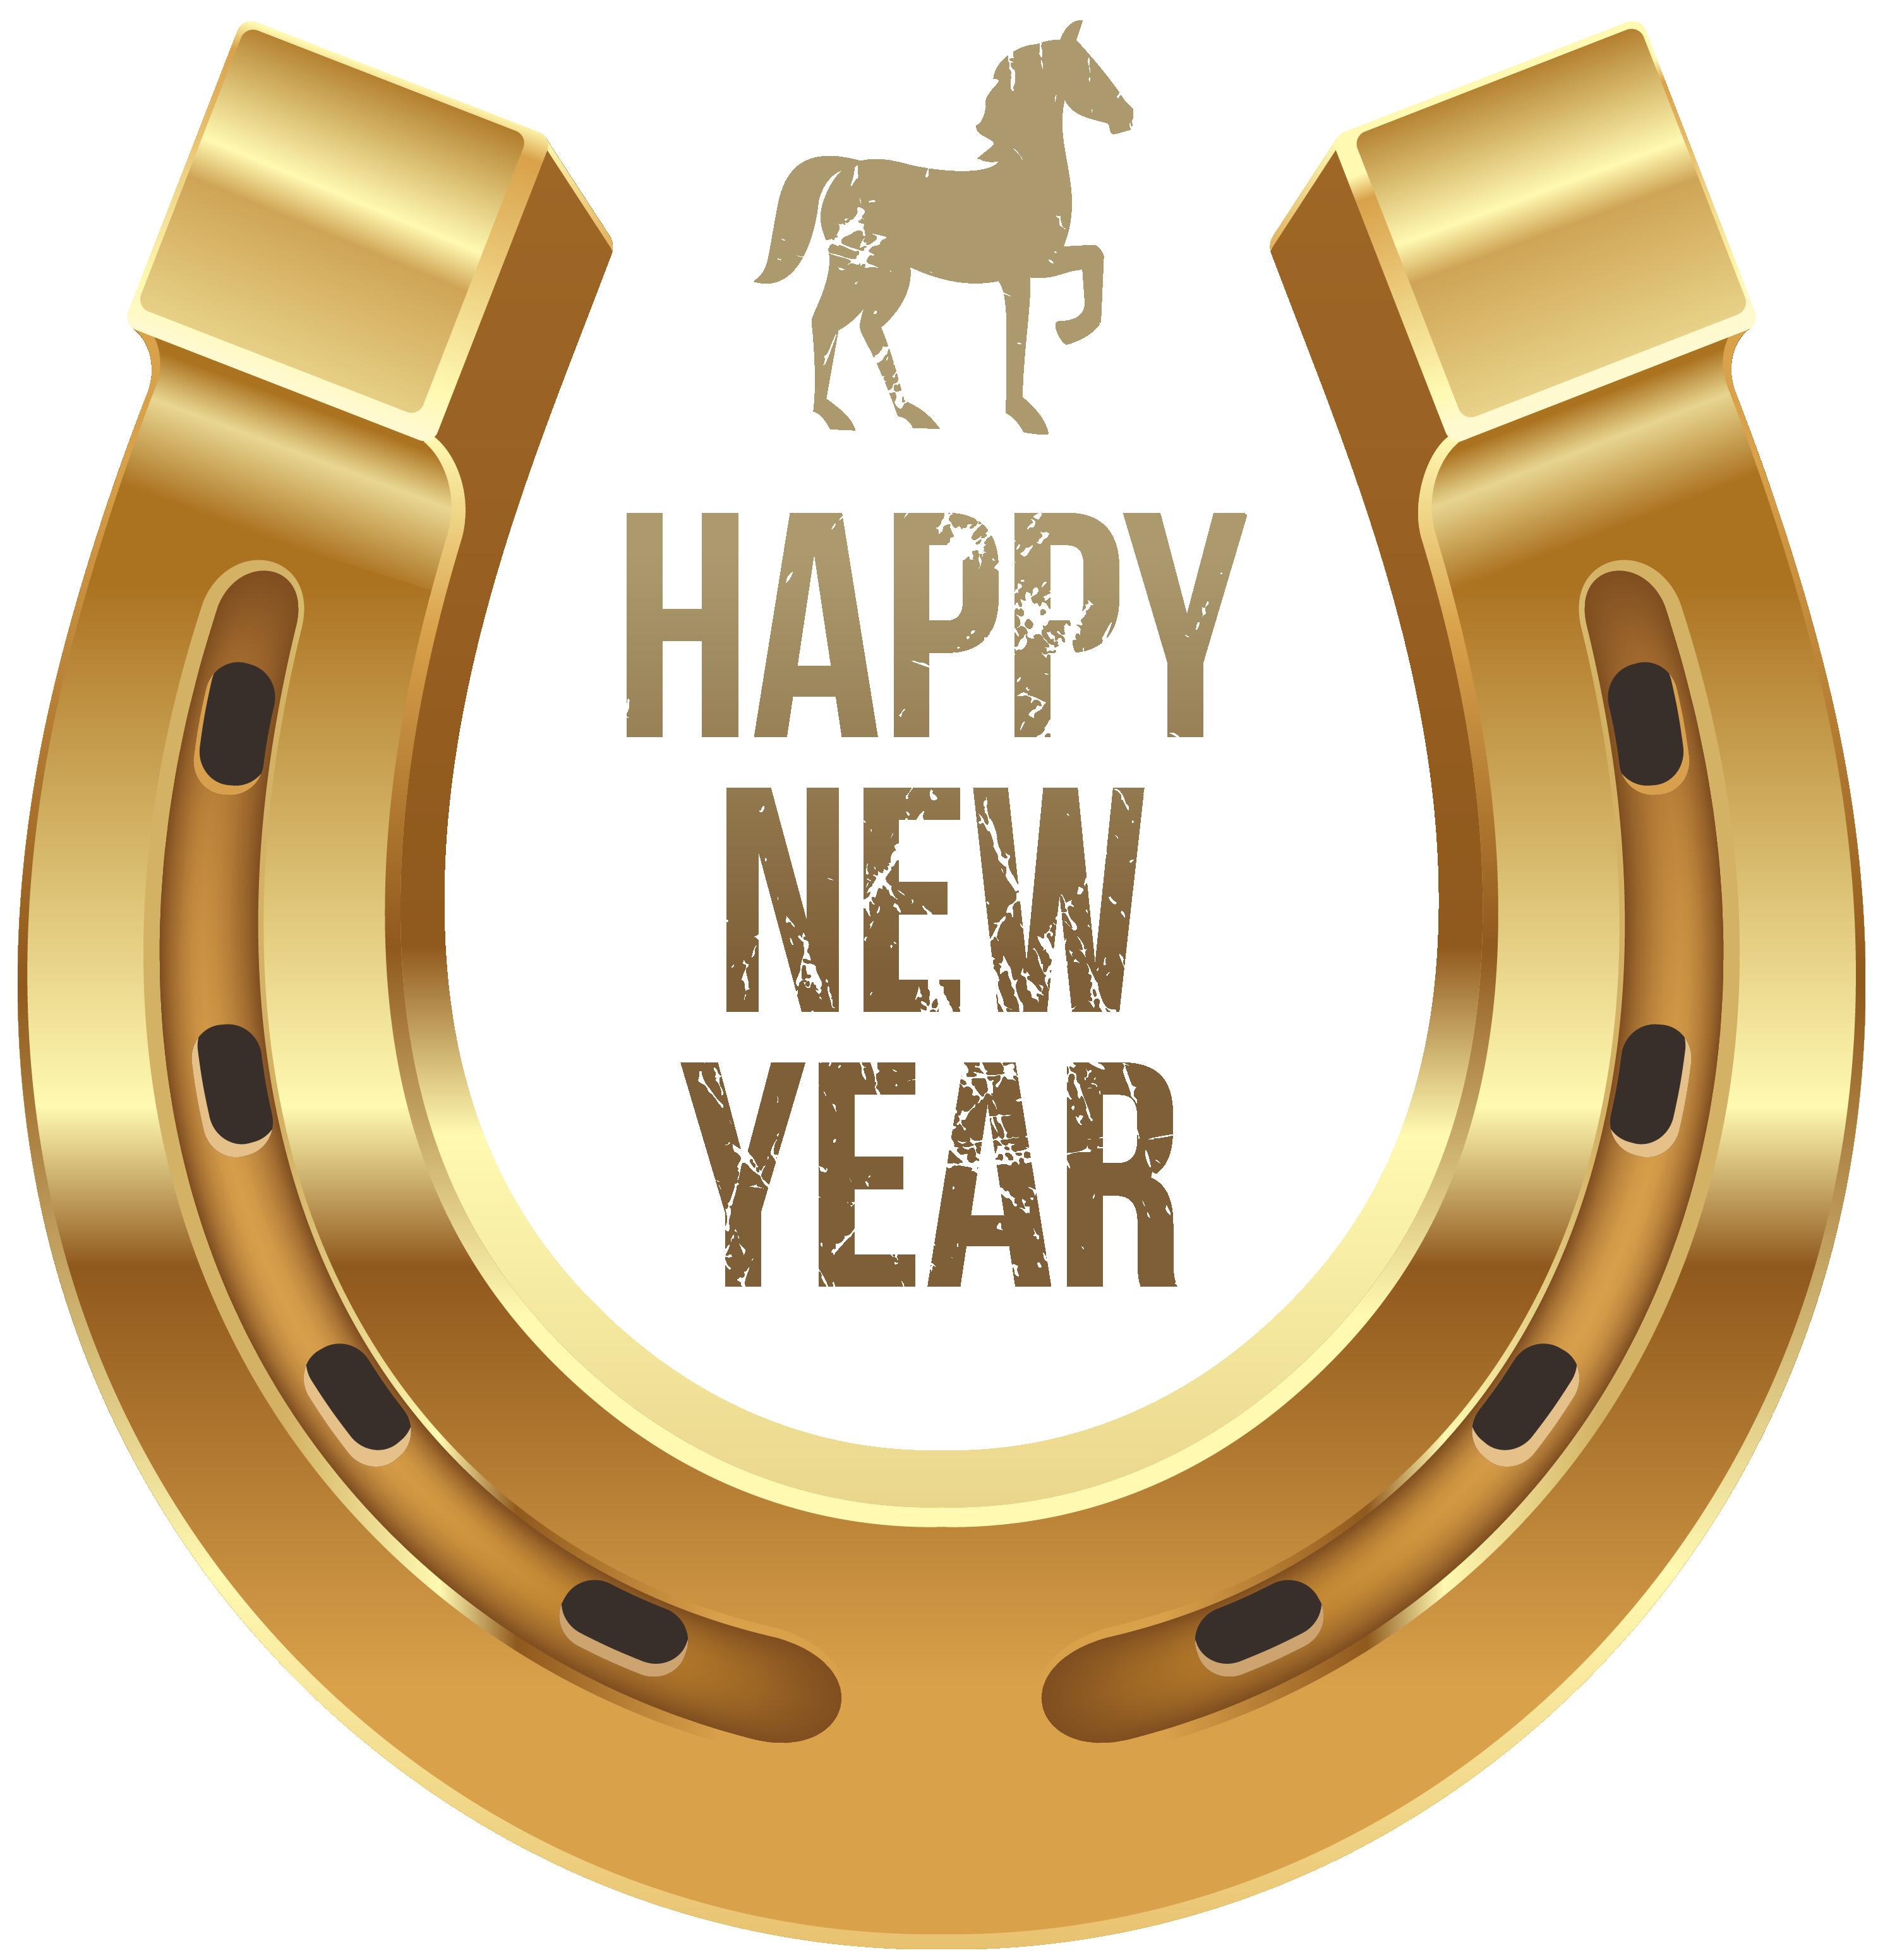 Gold horseshoe clip art horse shoe log clipart